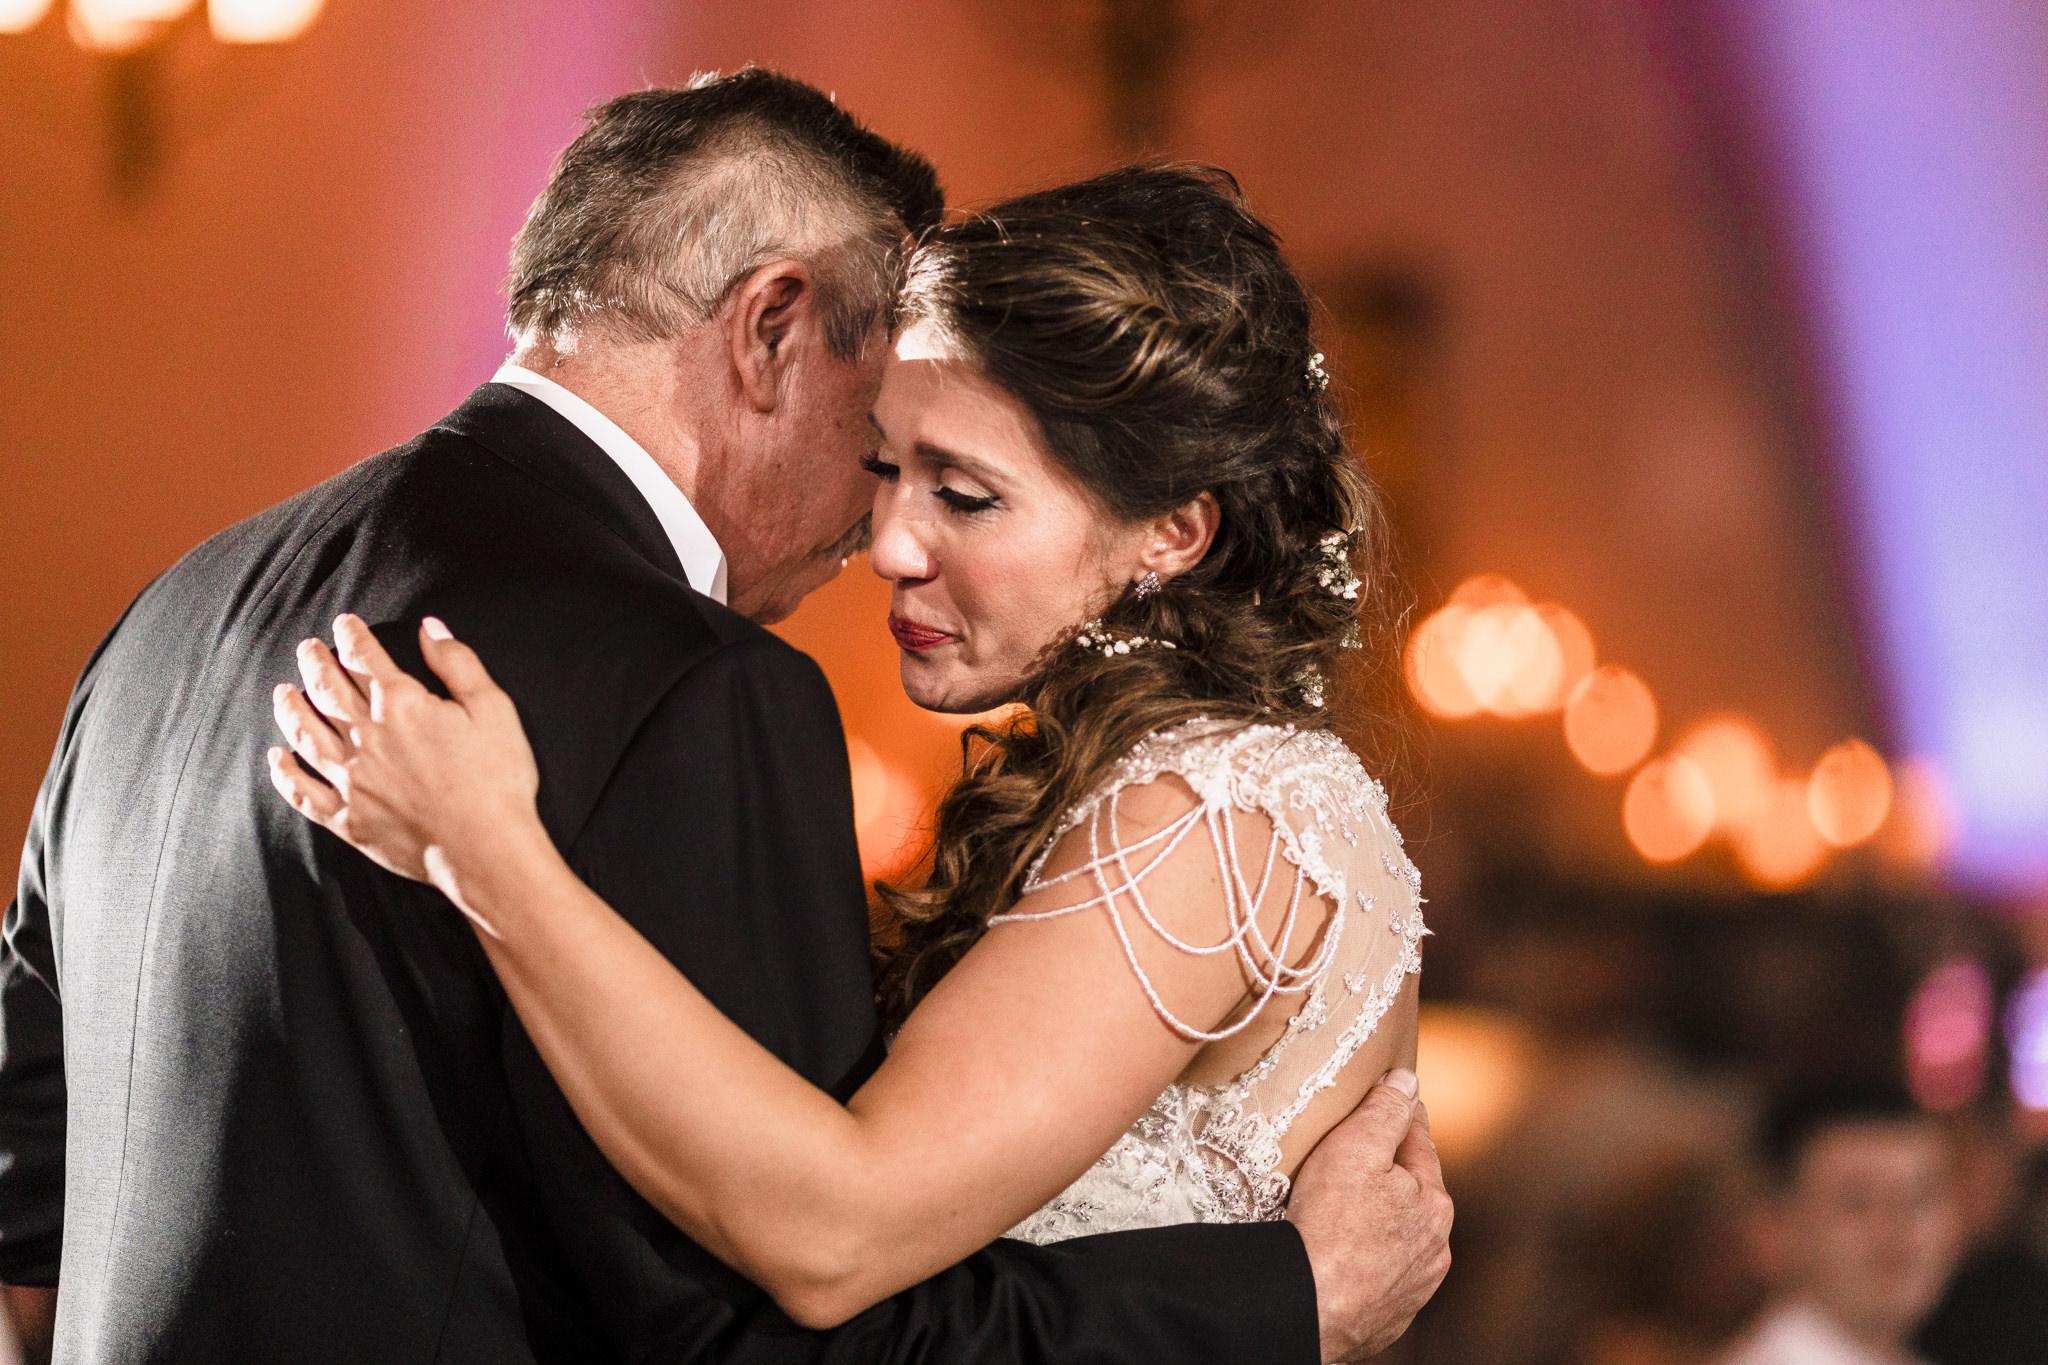 Barbato-Moorestown-Community-House-Wedding-New-Jersey-Photographer-32.JPG